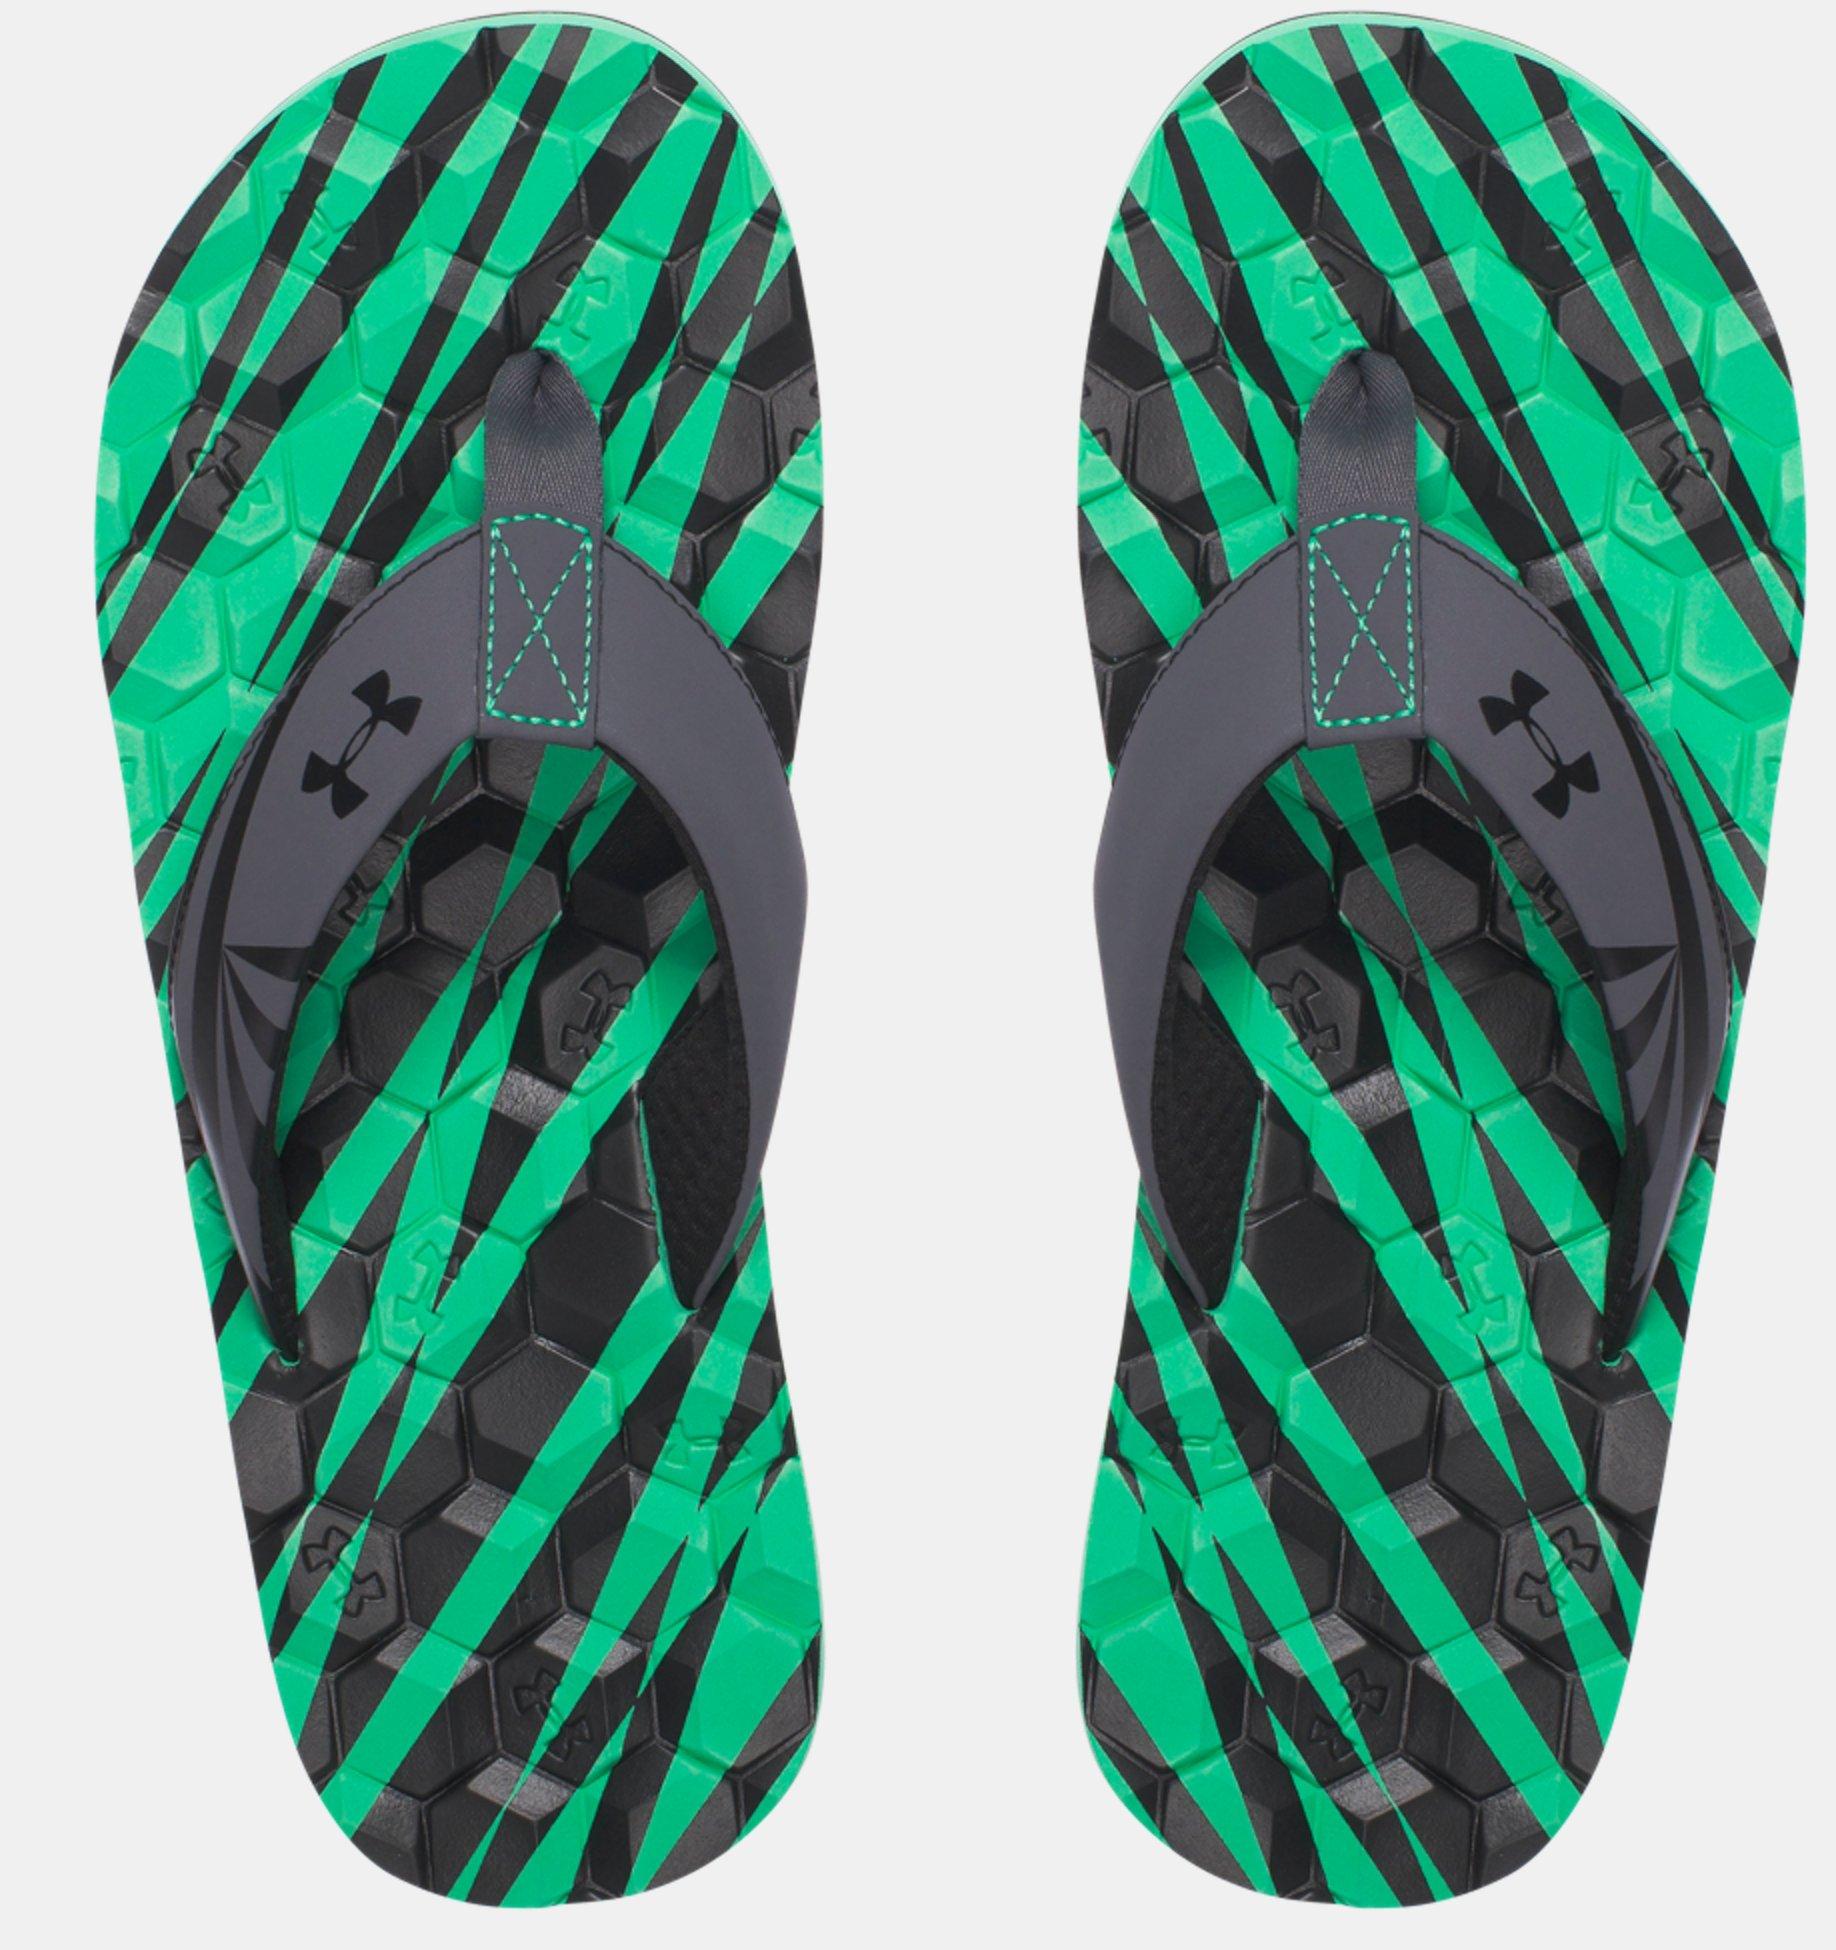 Žabky Under Armour Marathon Key II čierne zelené  2dc006c890f